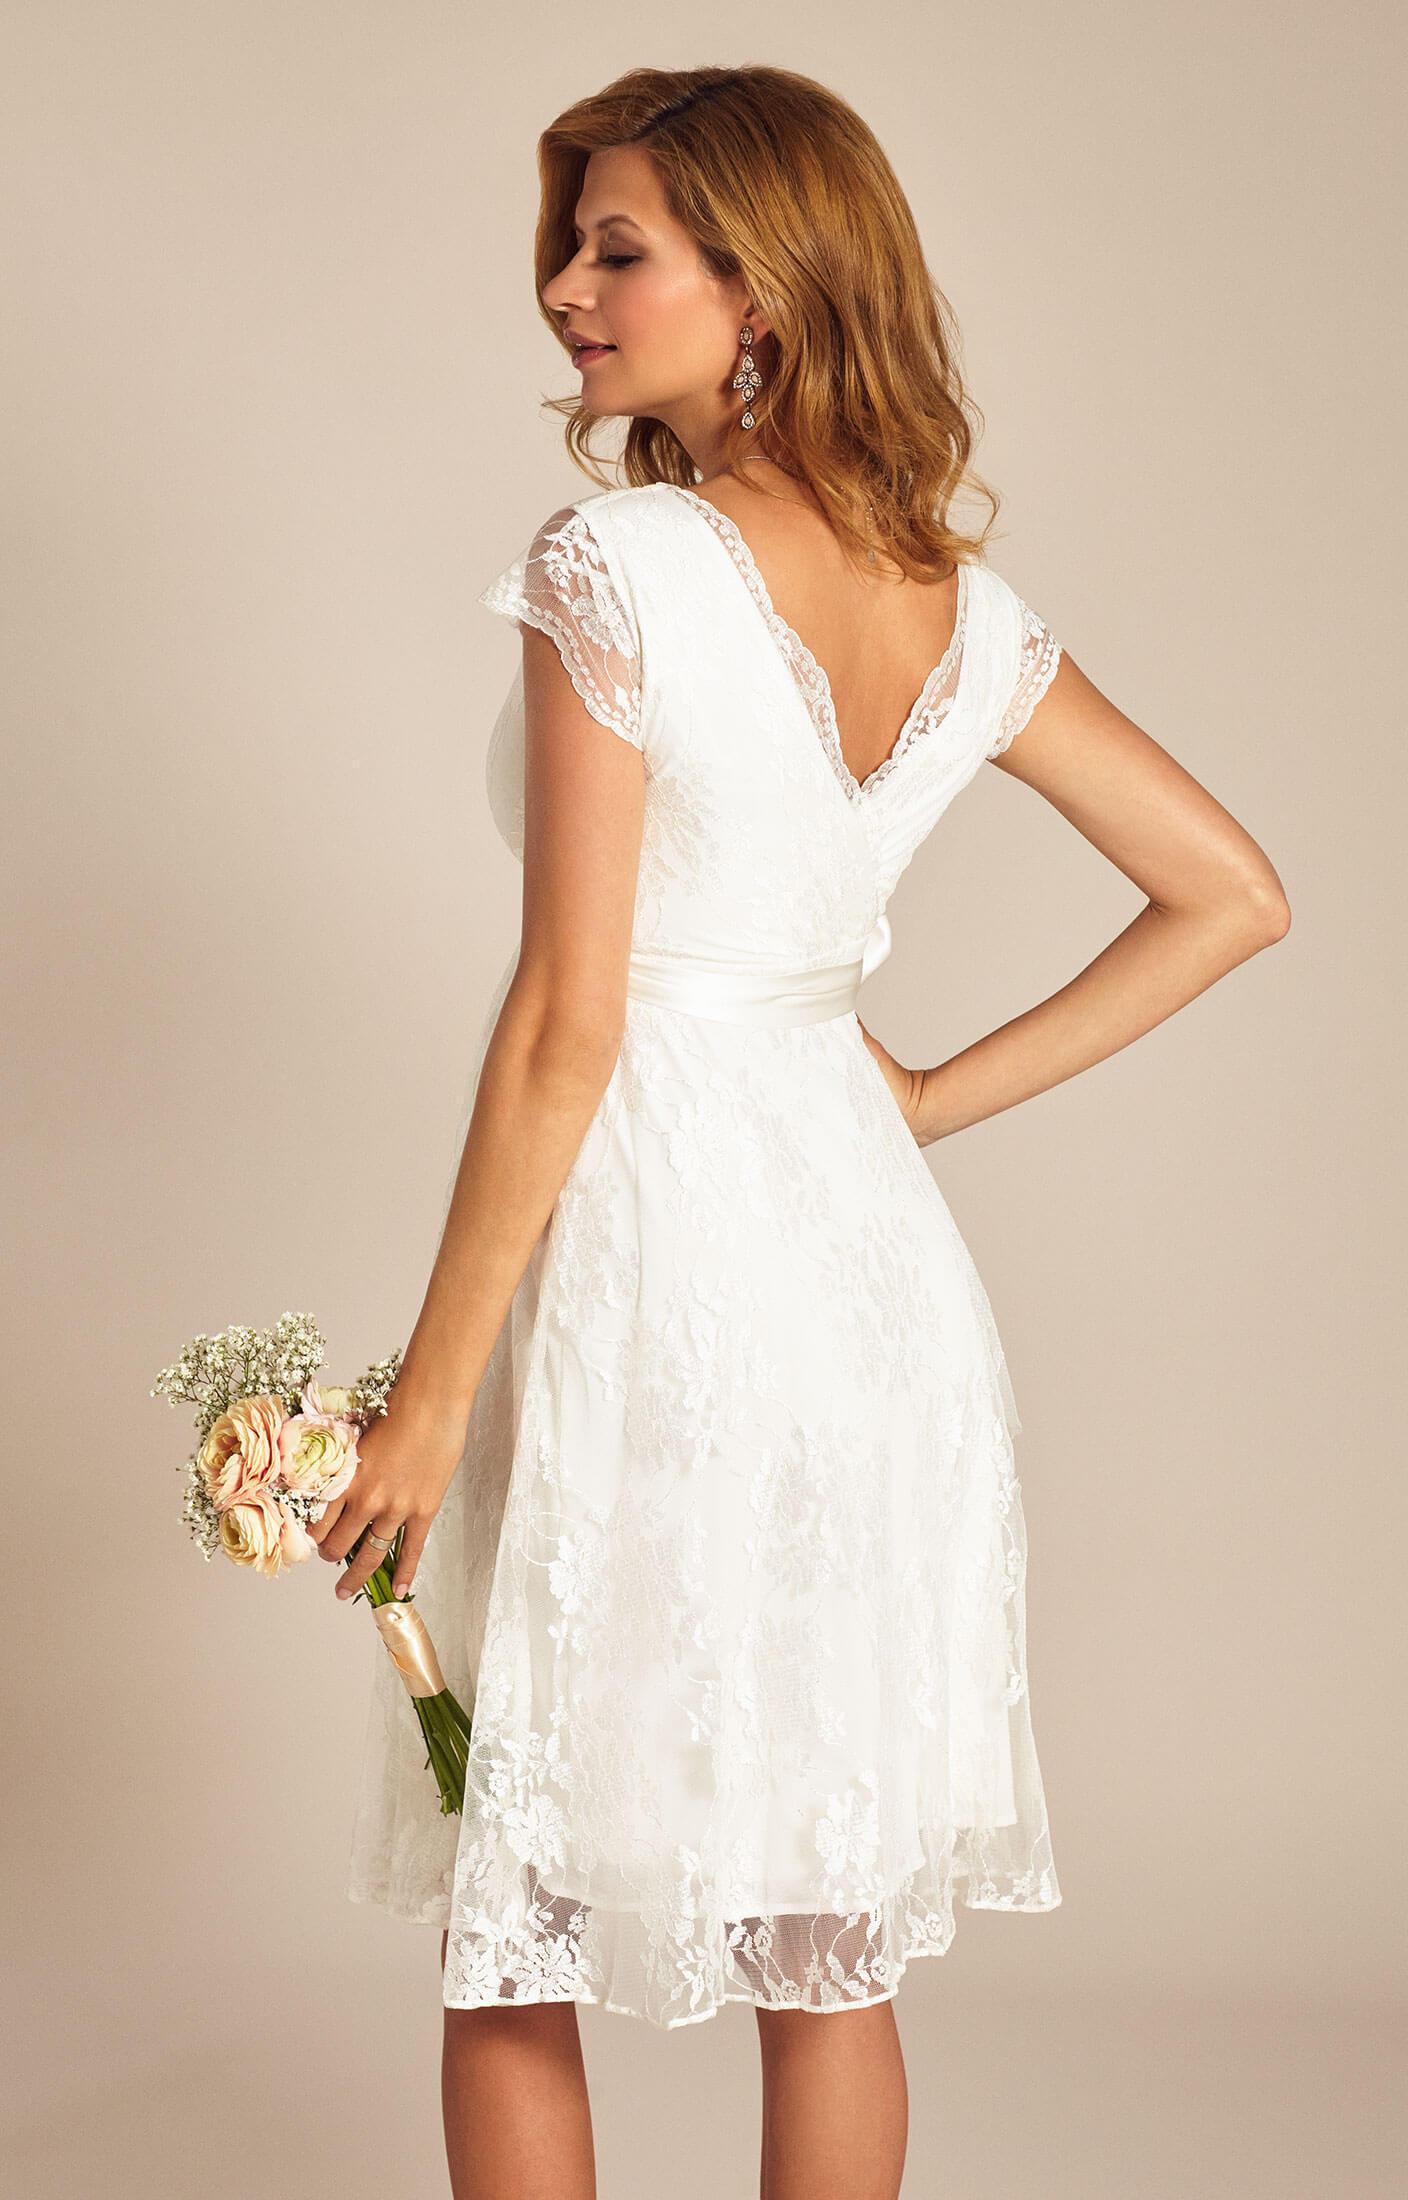 13 Cool Abendkleid Kurz Ärmel17 Spektakulär Abendkleid Kurz Vertrieb